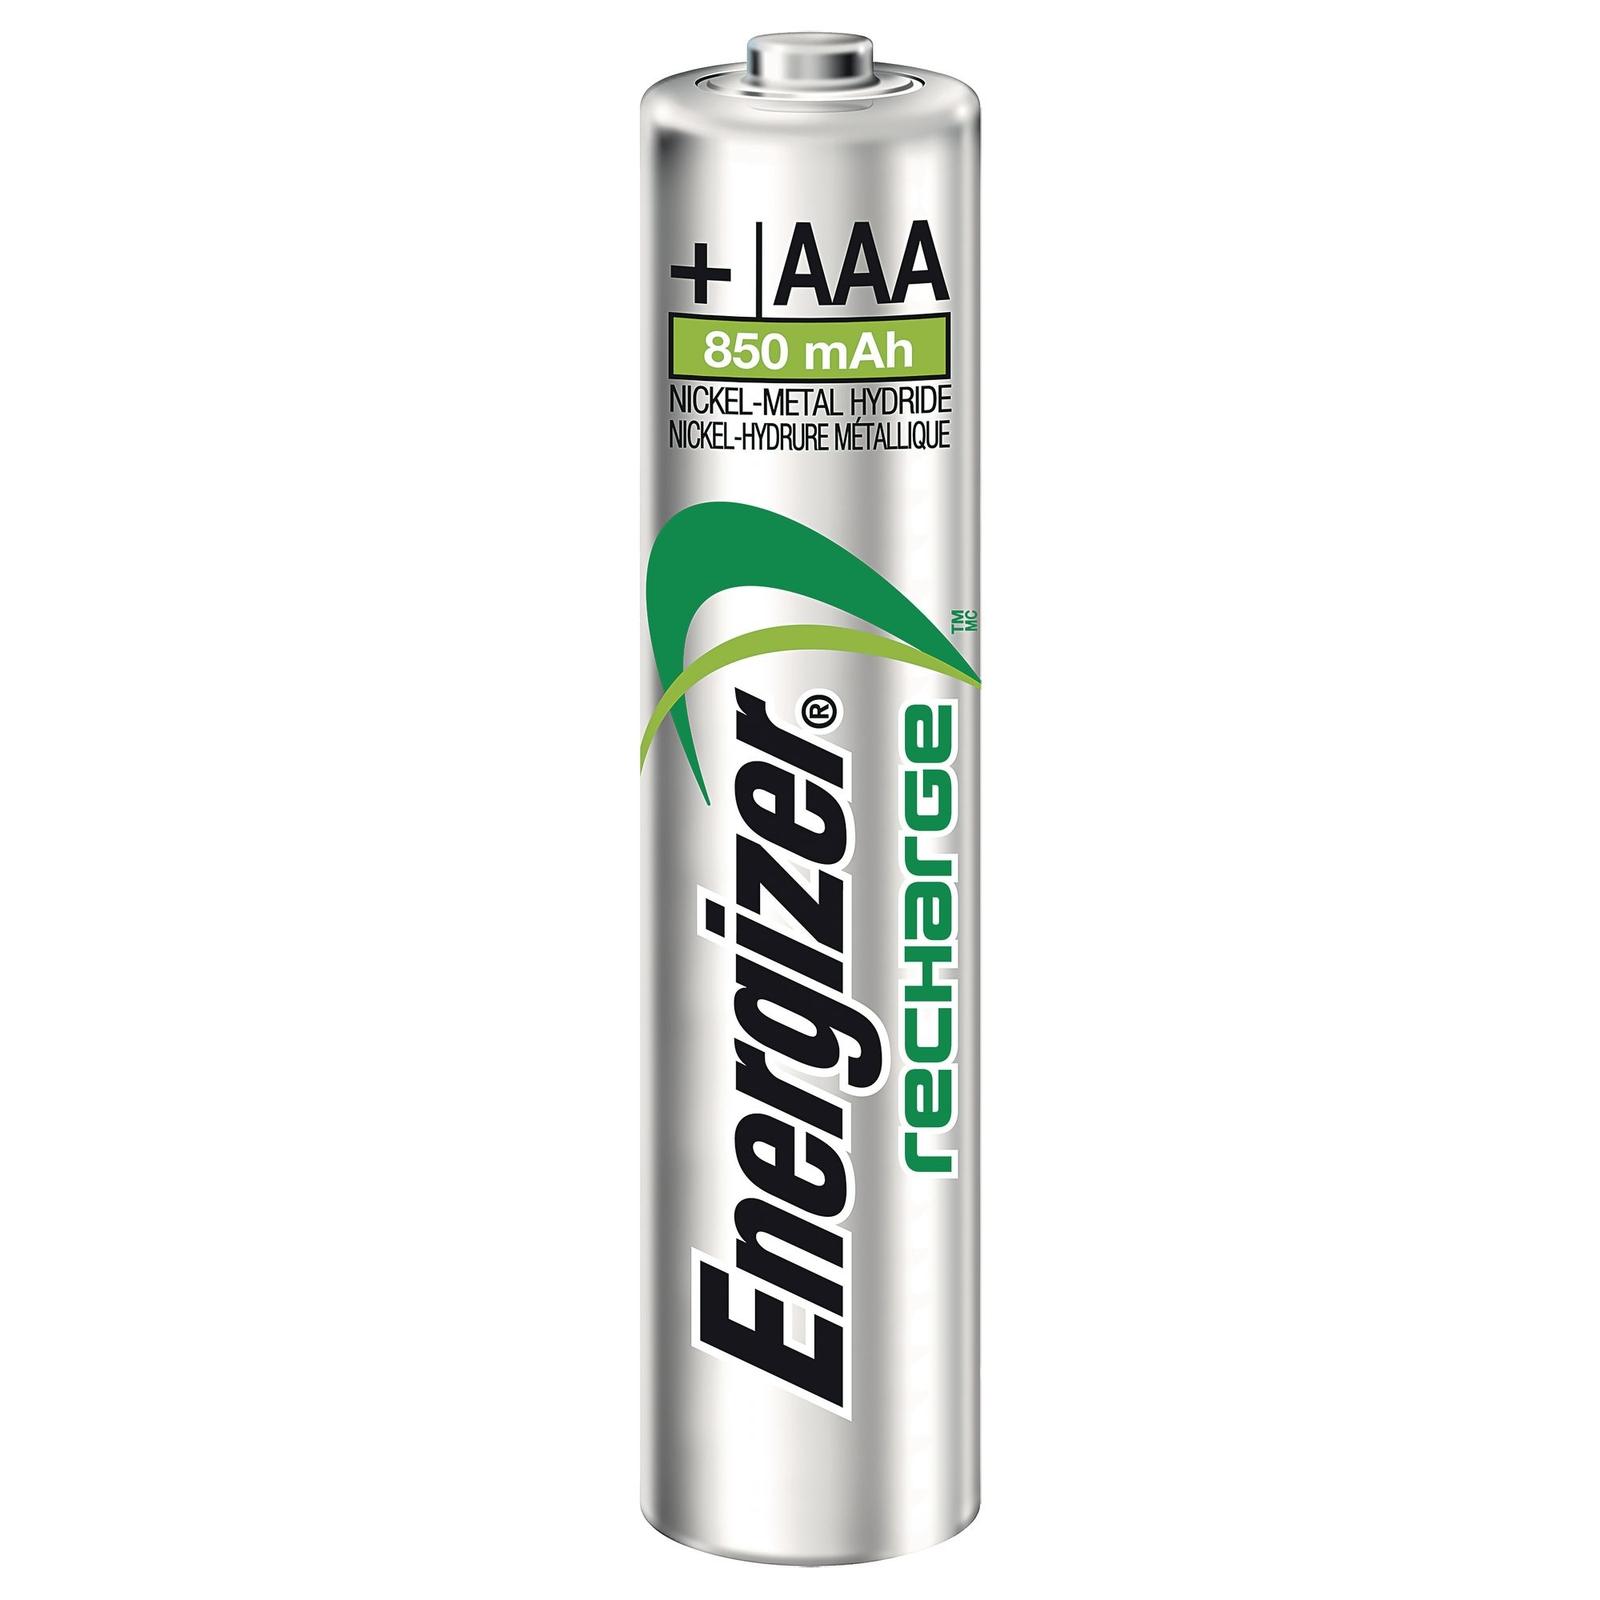 Nickel Metal Hydride Battery : Rechargeable nickel metal hydride battery aaa hr